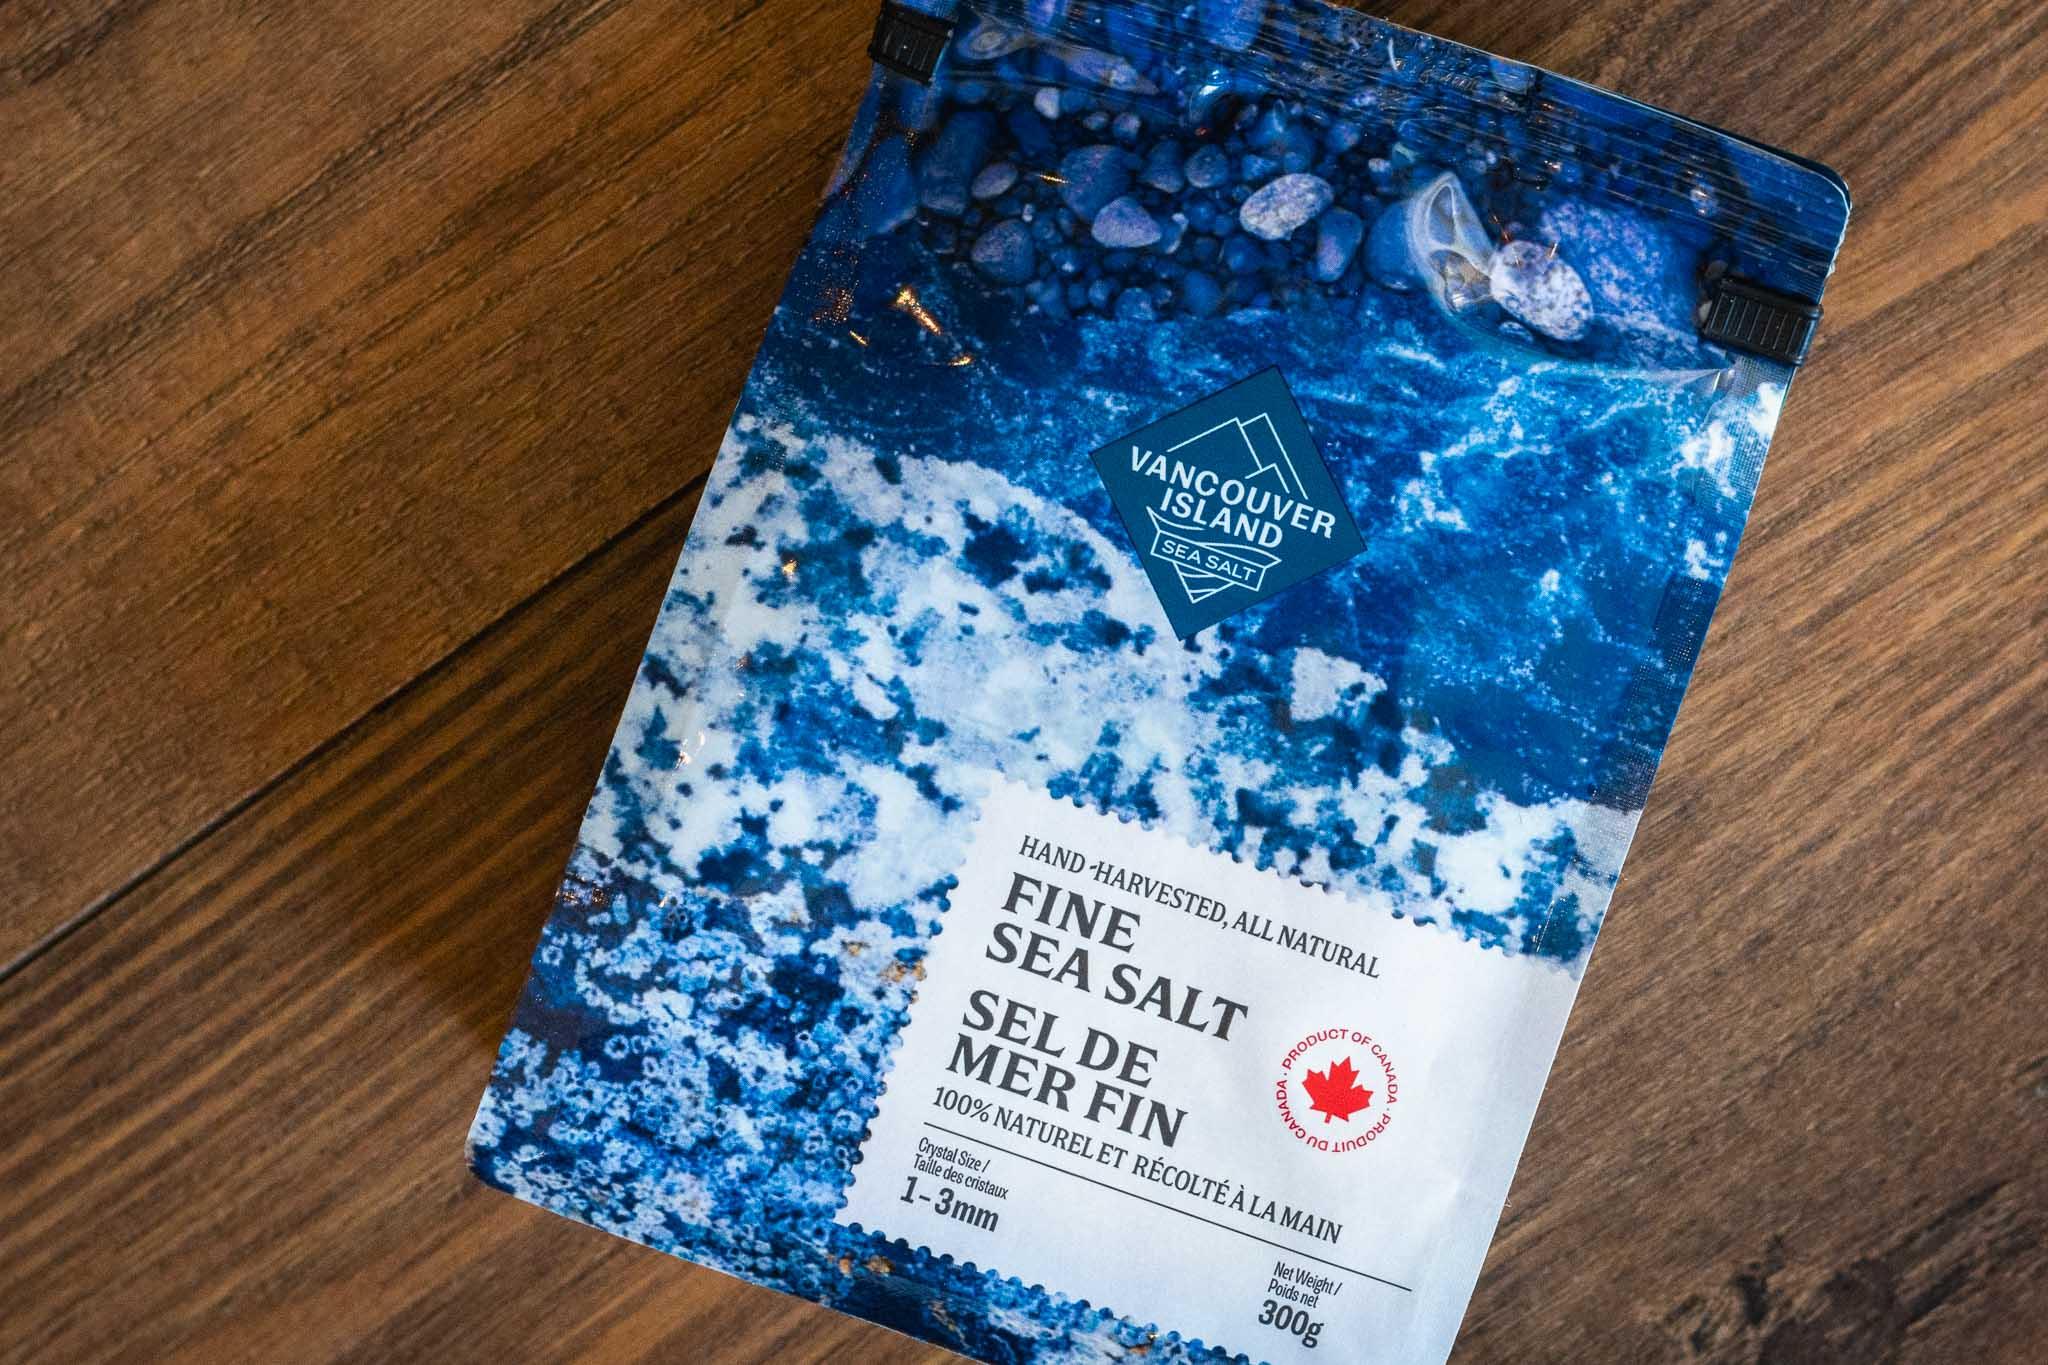 Fine Sea Salt by Vancouver Island Sea Salt